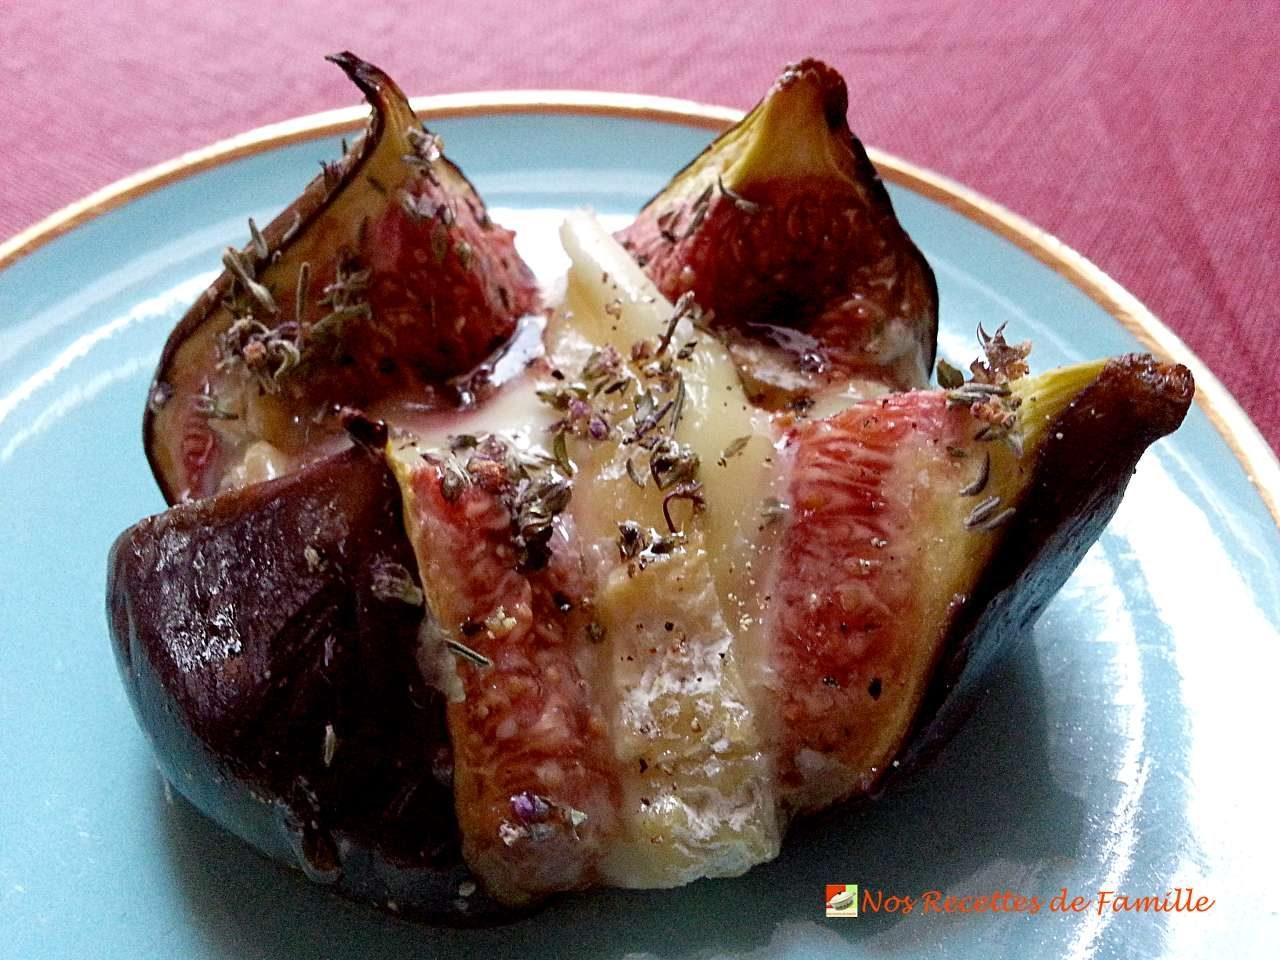 Figues-roties-au-chevre-miel-et-thym-1280x960.jpg